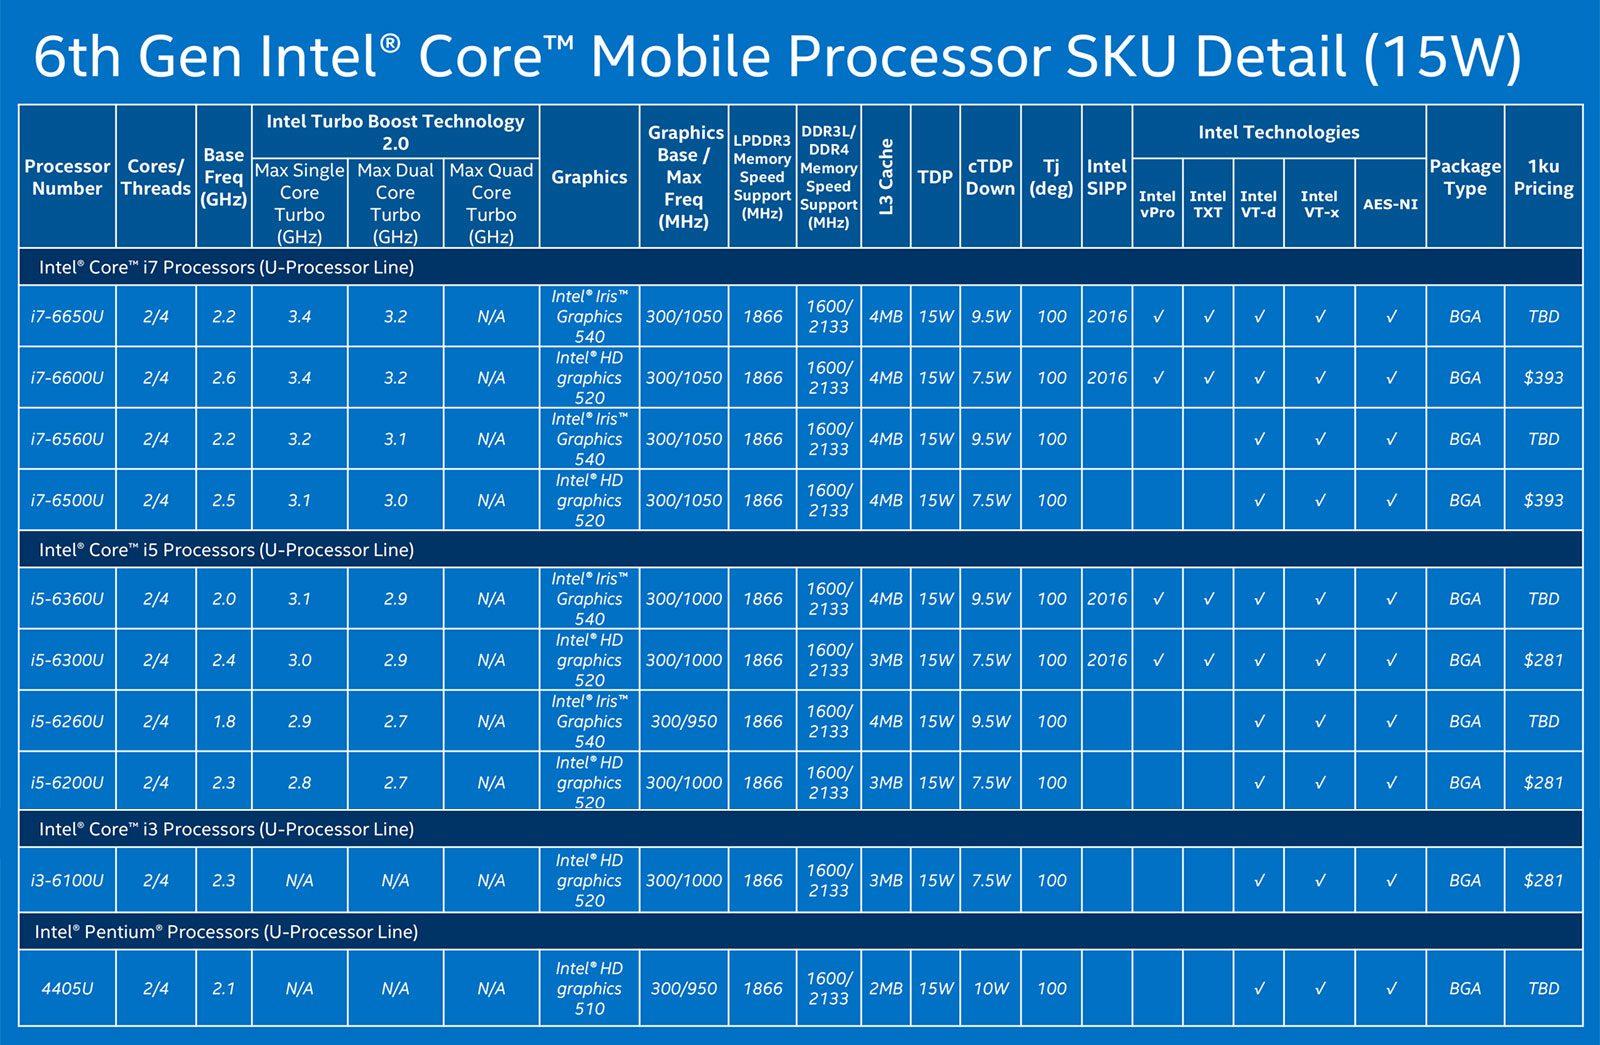 pci simple communications controller driver win7 64bit download